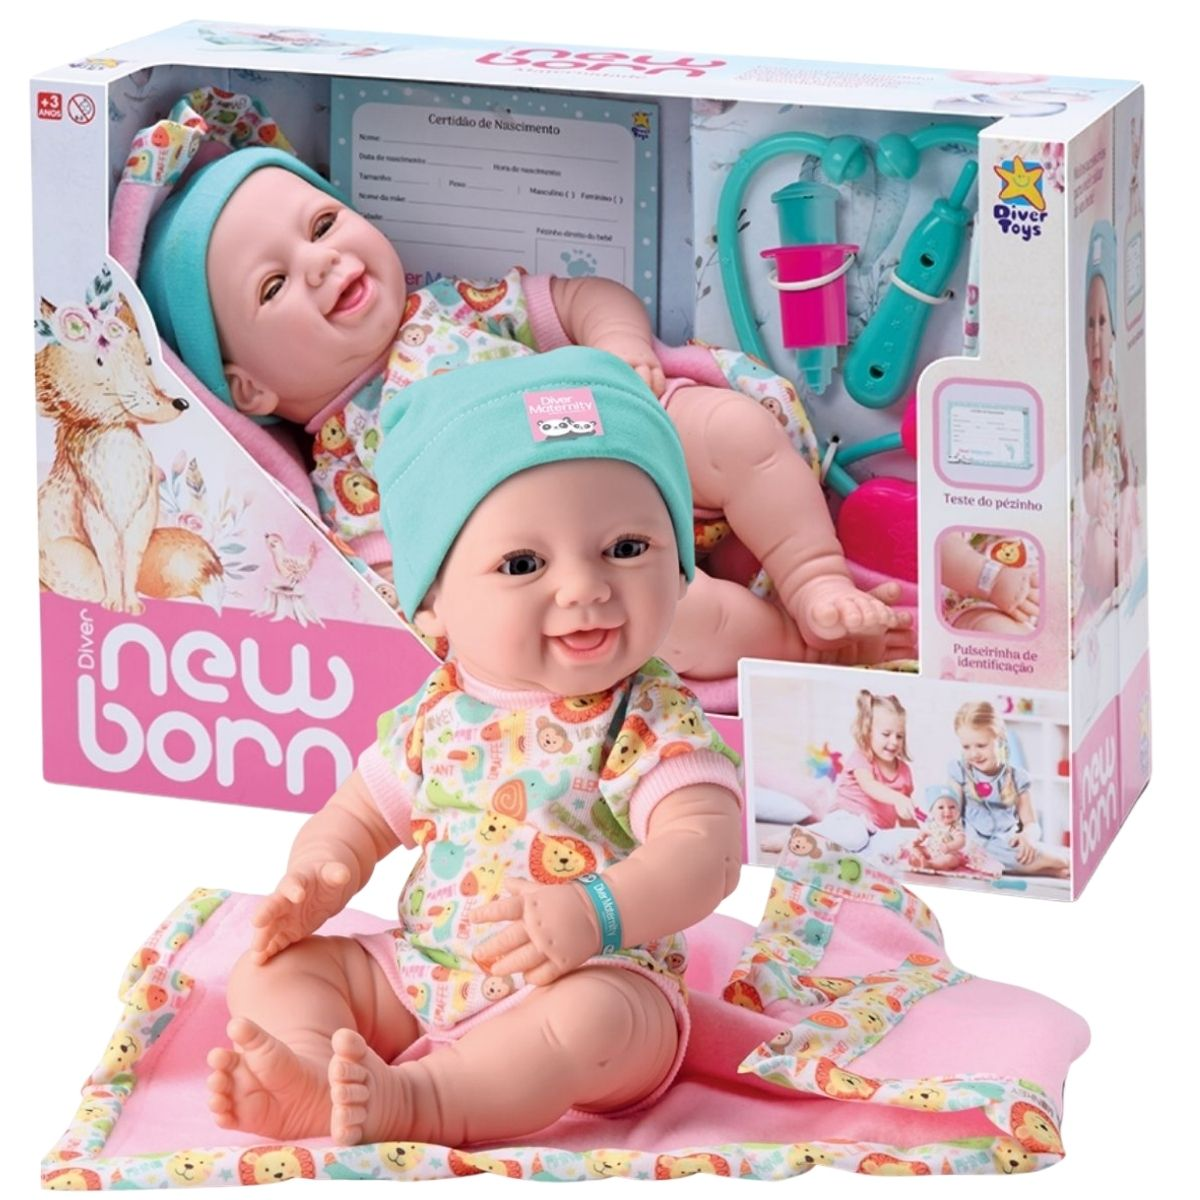 Boneca Bebe New Born Reborn Maternidade Abre E Fecha Olhos Divertoys